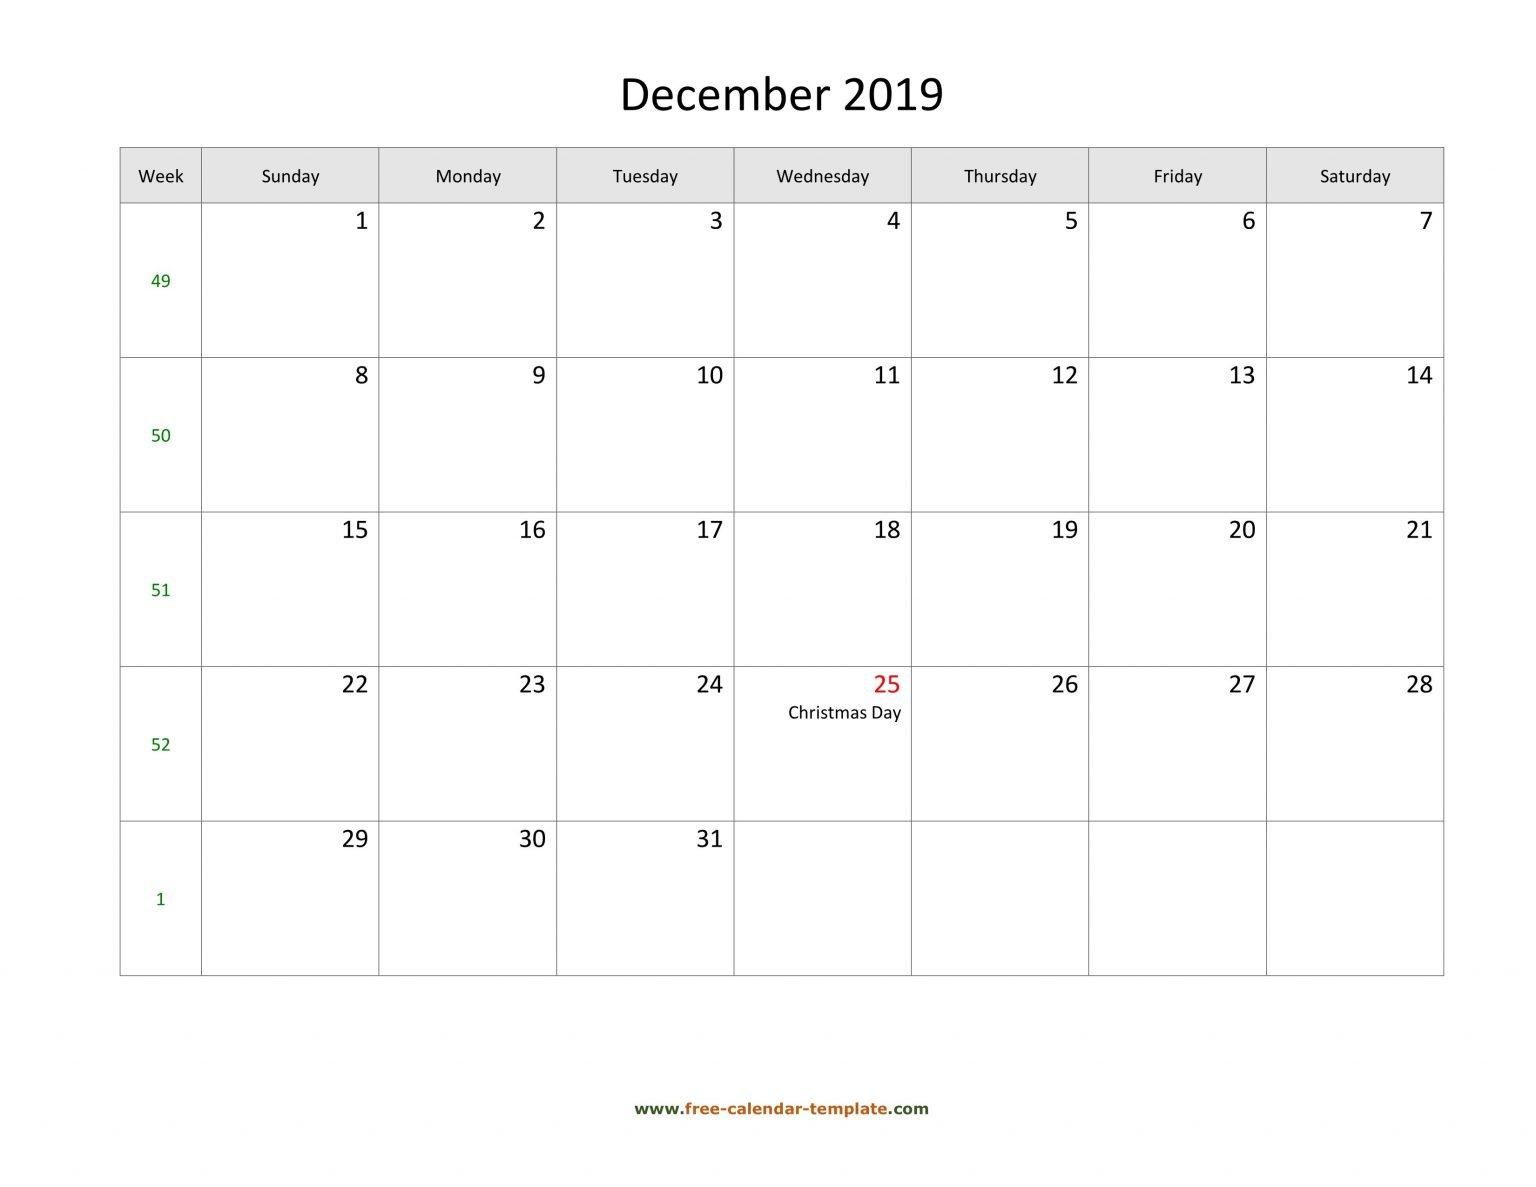 Retirement Countdown Calendars Printable :-Free Calendar Free Calendar That I Can Edit